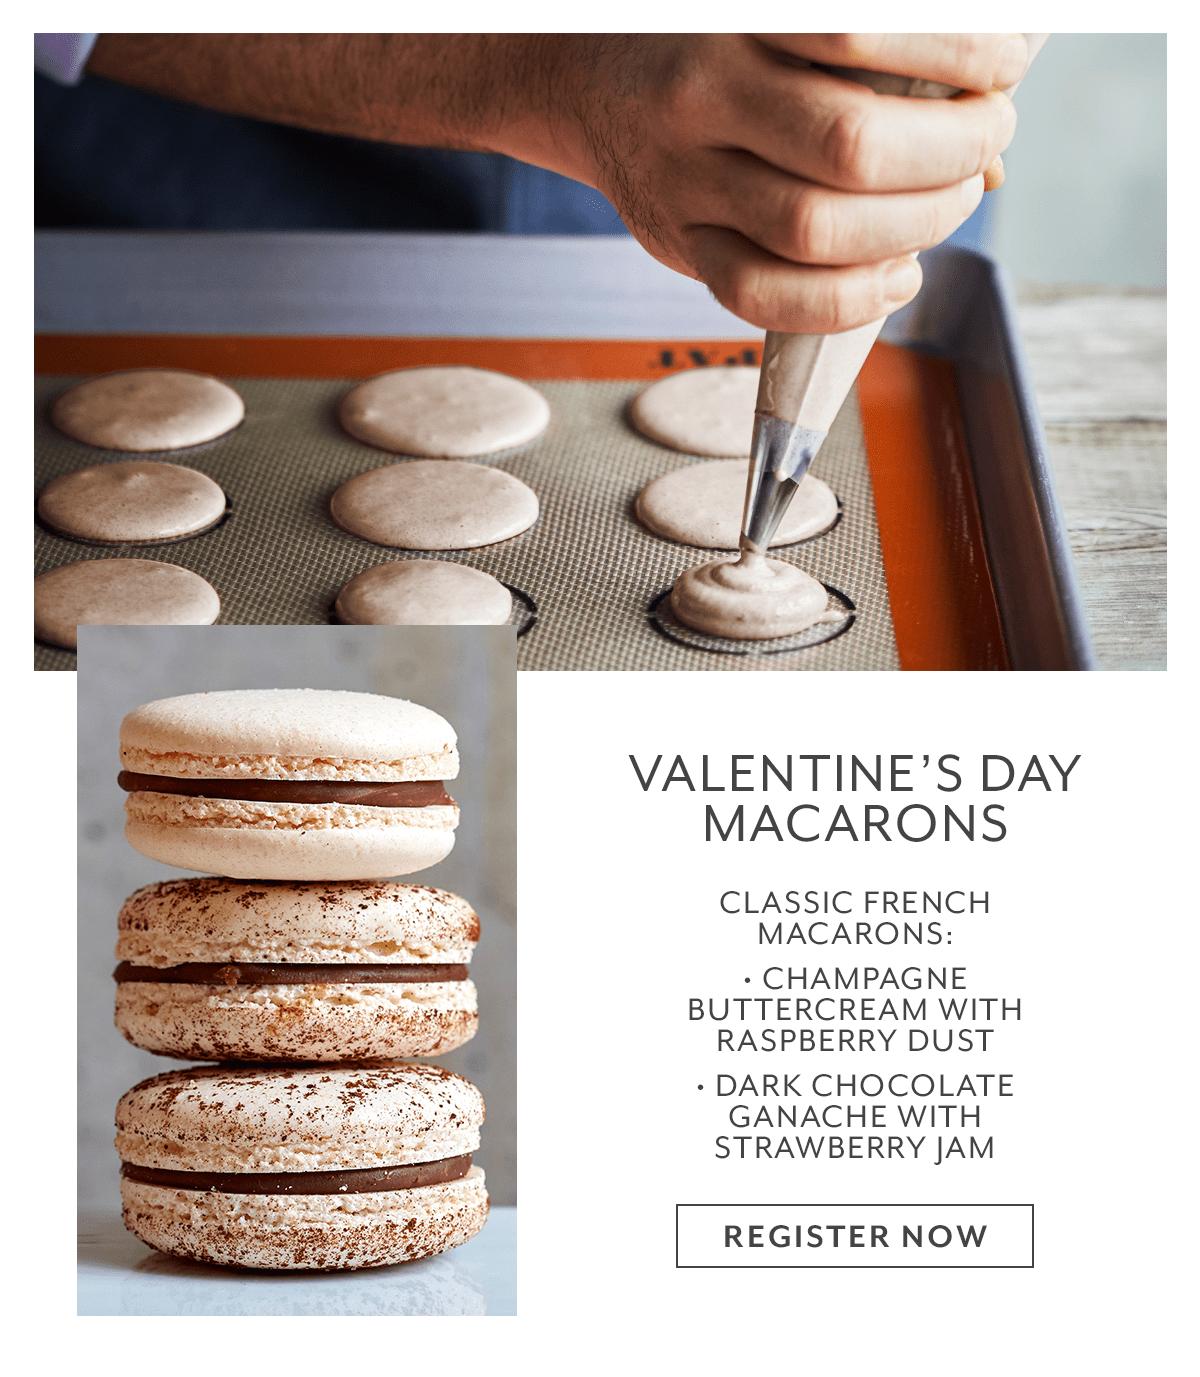 Class - Valentine's Day Macarons